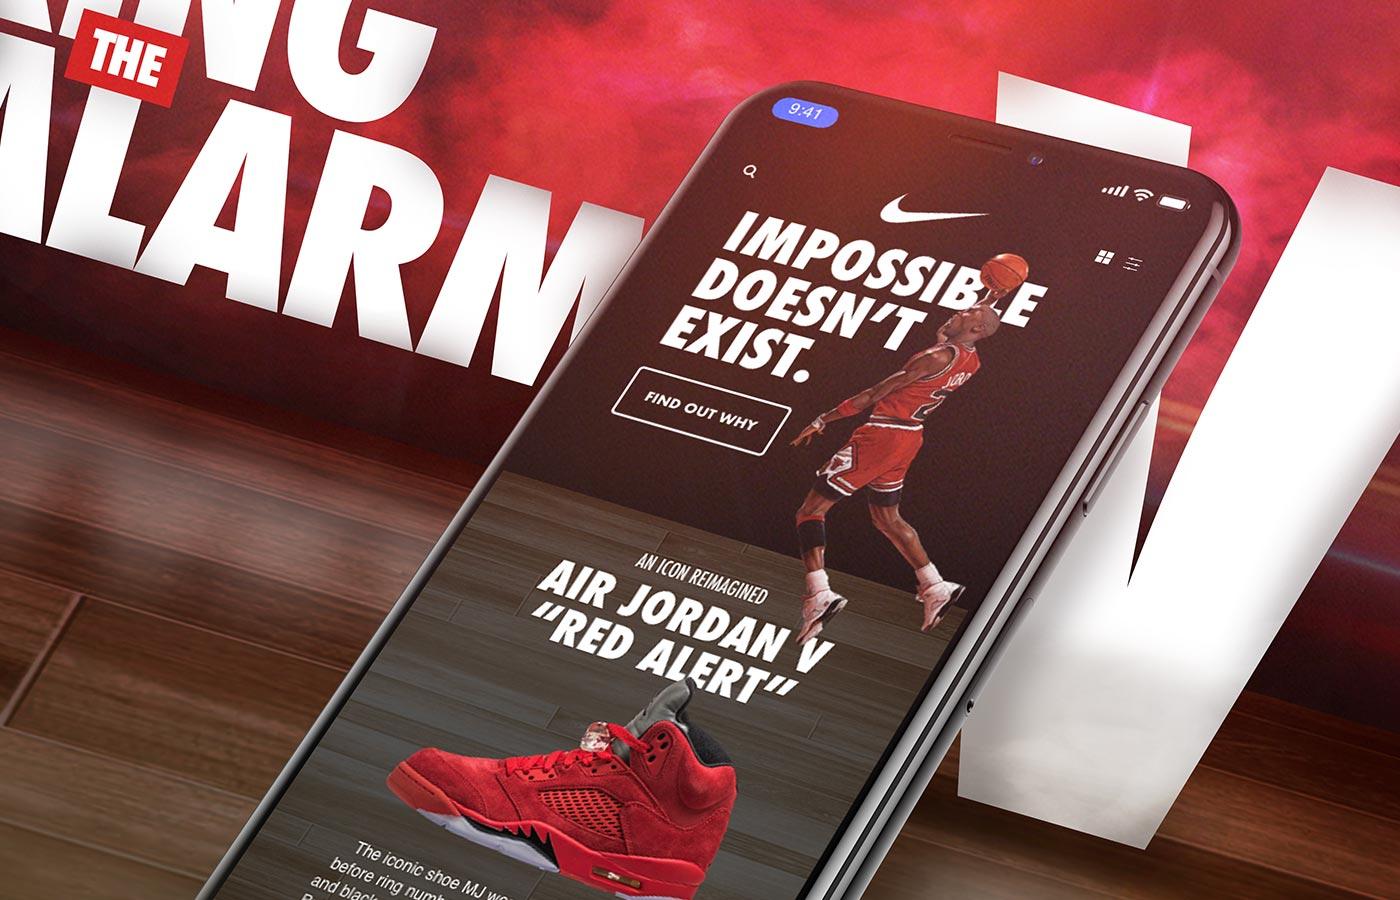 Nike SNKRS App UI Redesign Mockup in iPhone X